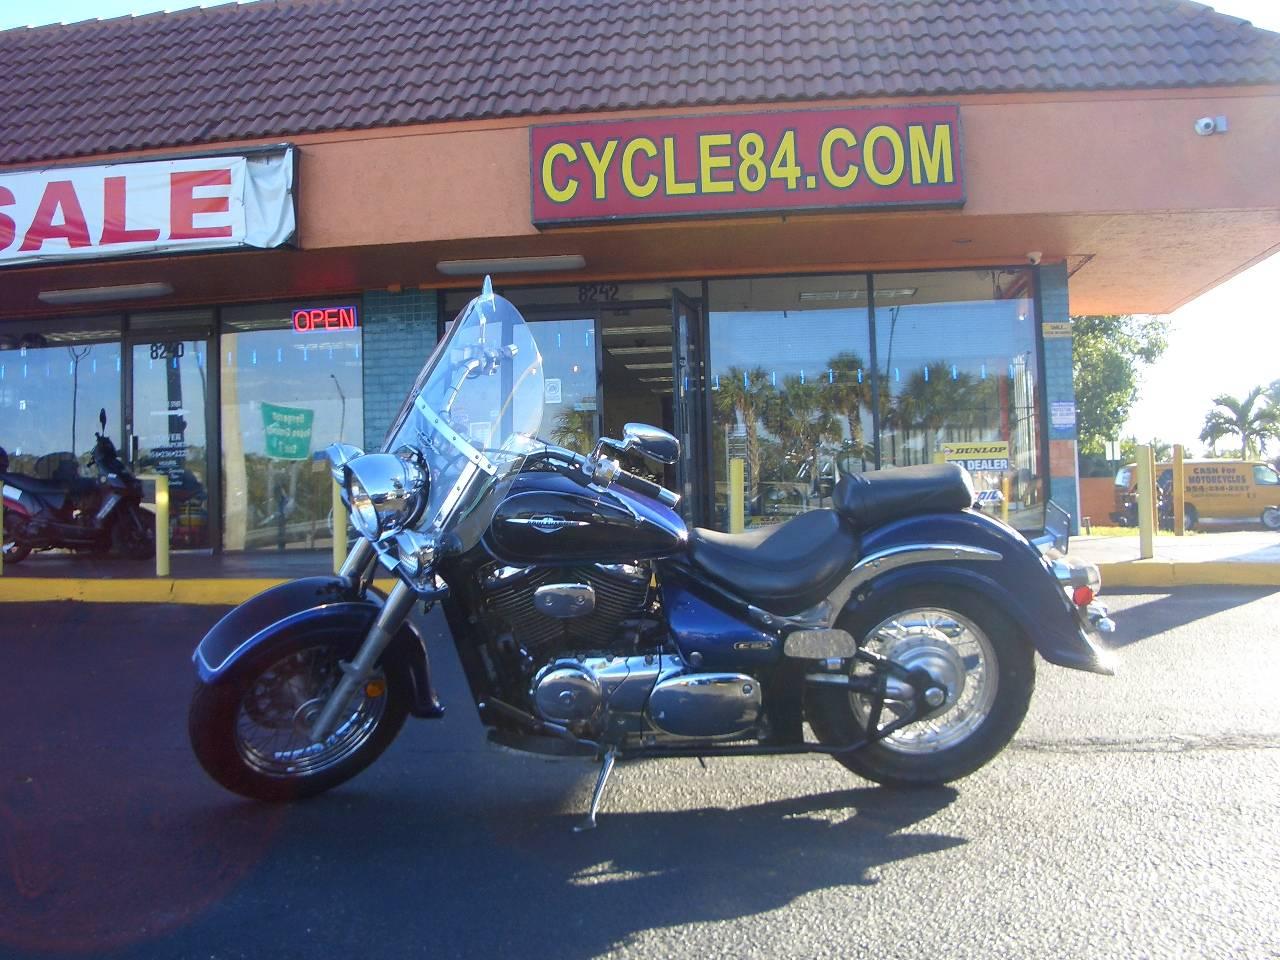 2005 Suzuki Boulevard C50 Black Blue Motorcycles Fort Lauderdale